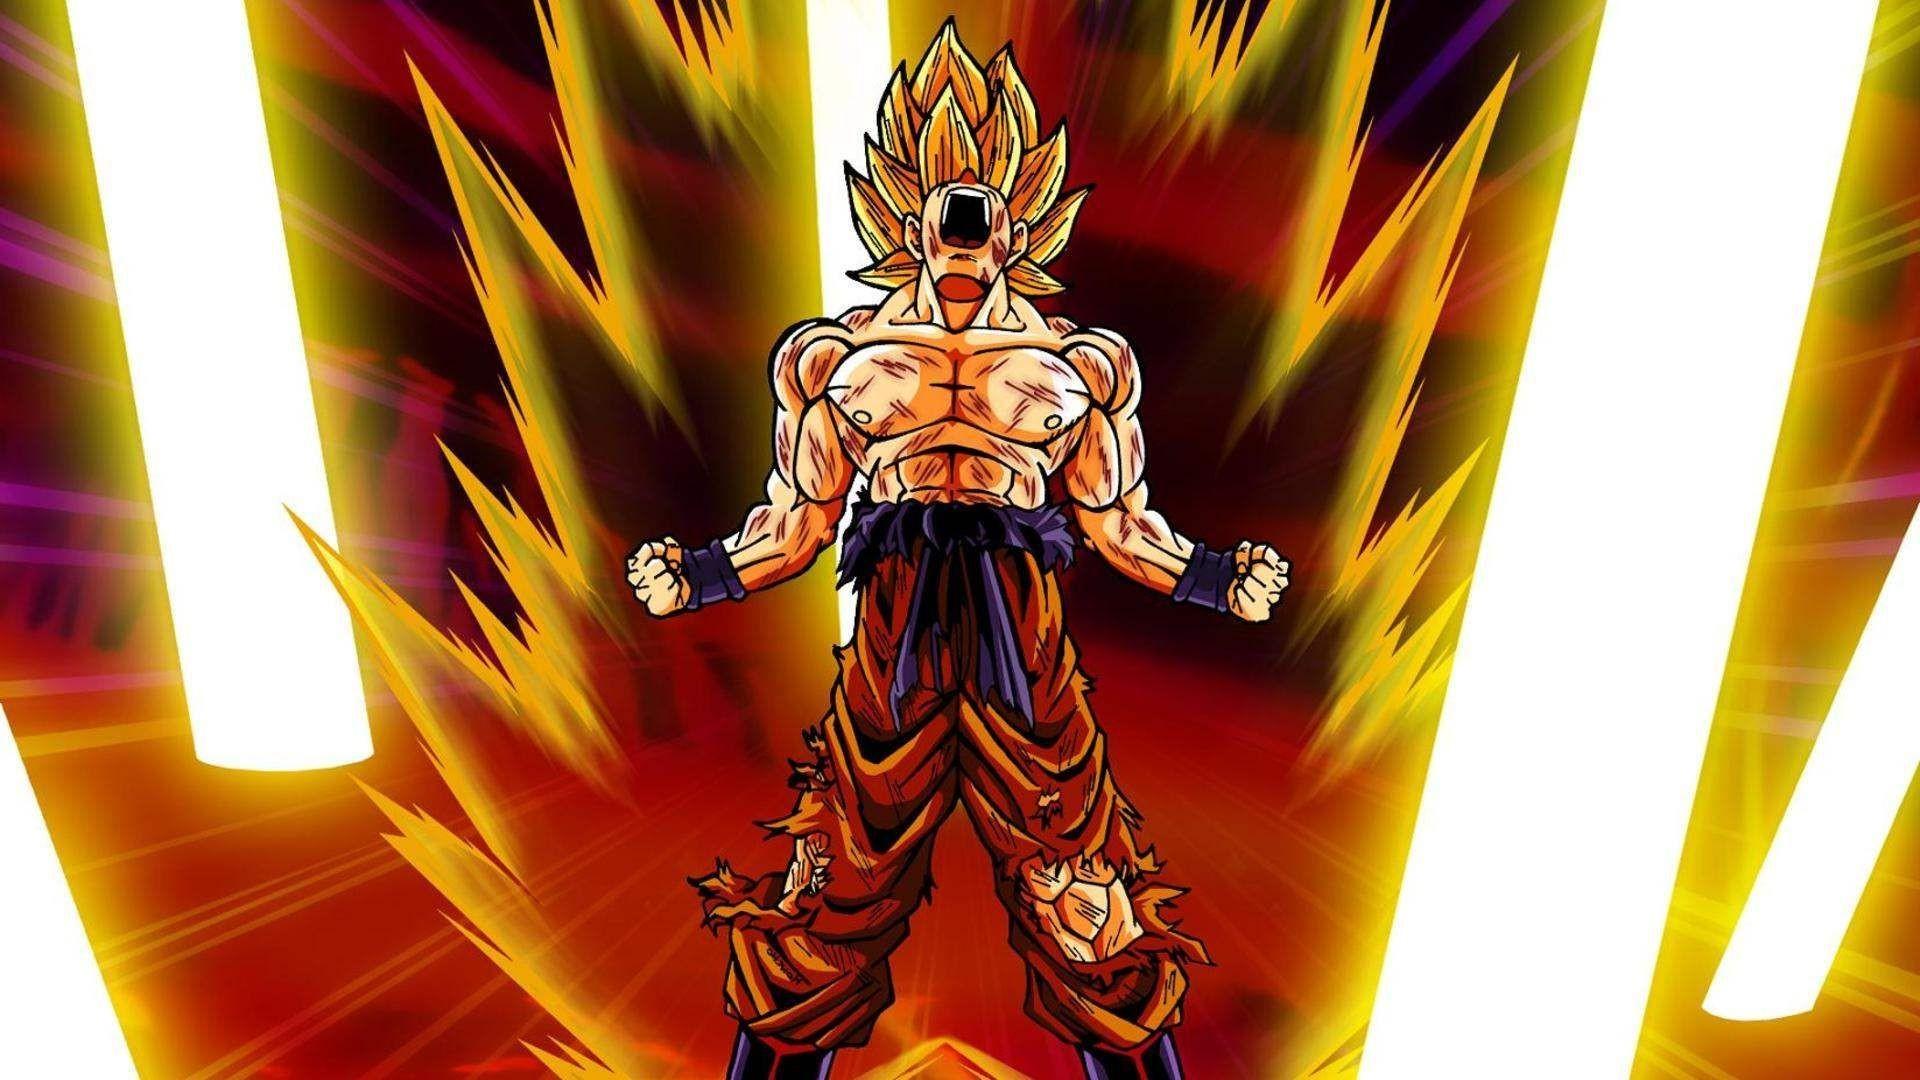 Dragon Ball Z Goku Wallpapers High Quality Download Free